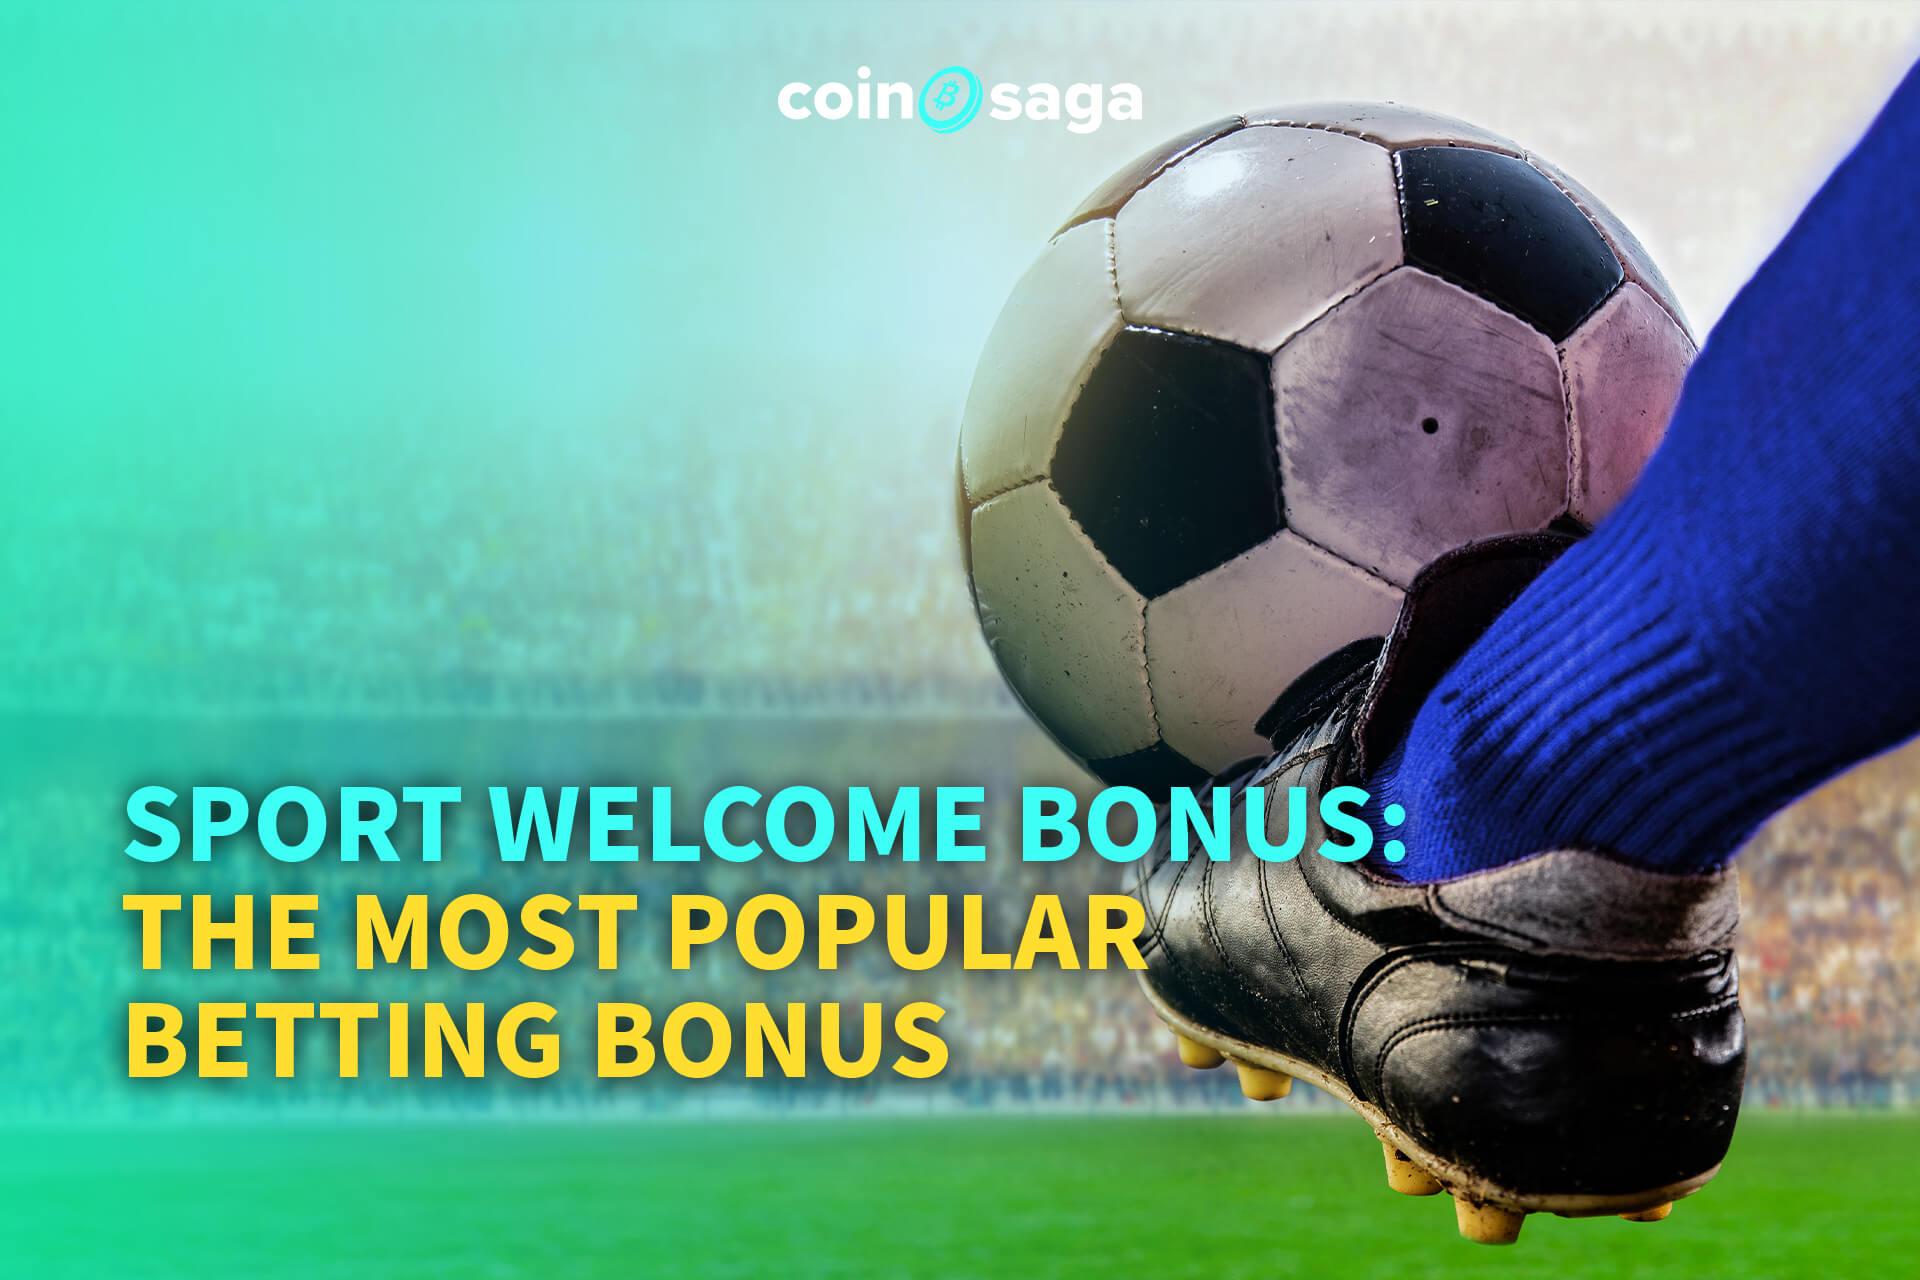 sport welcome bonus